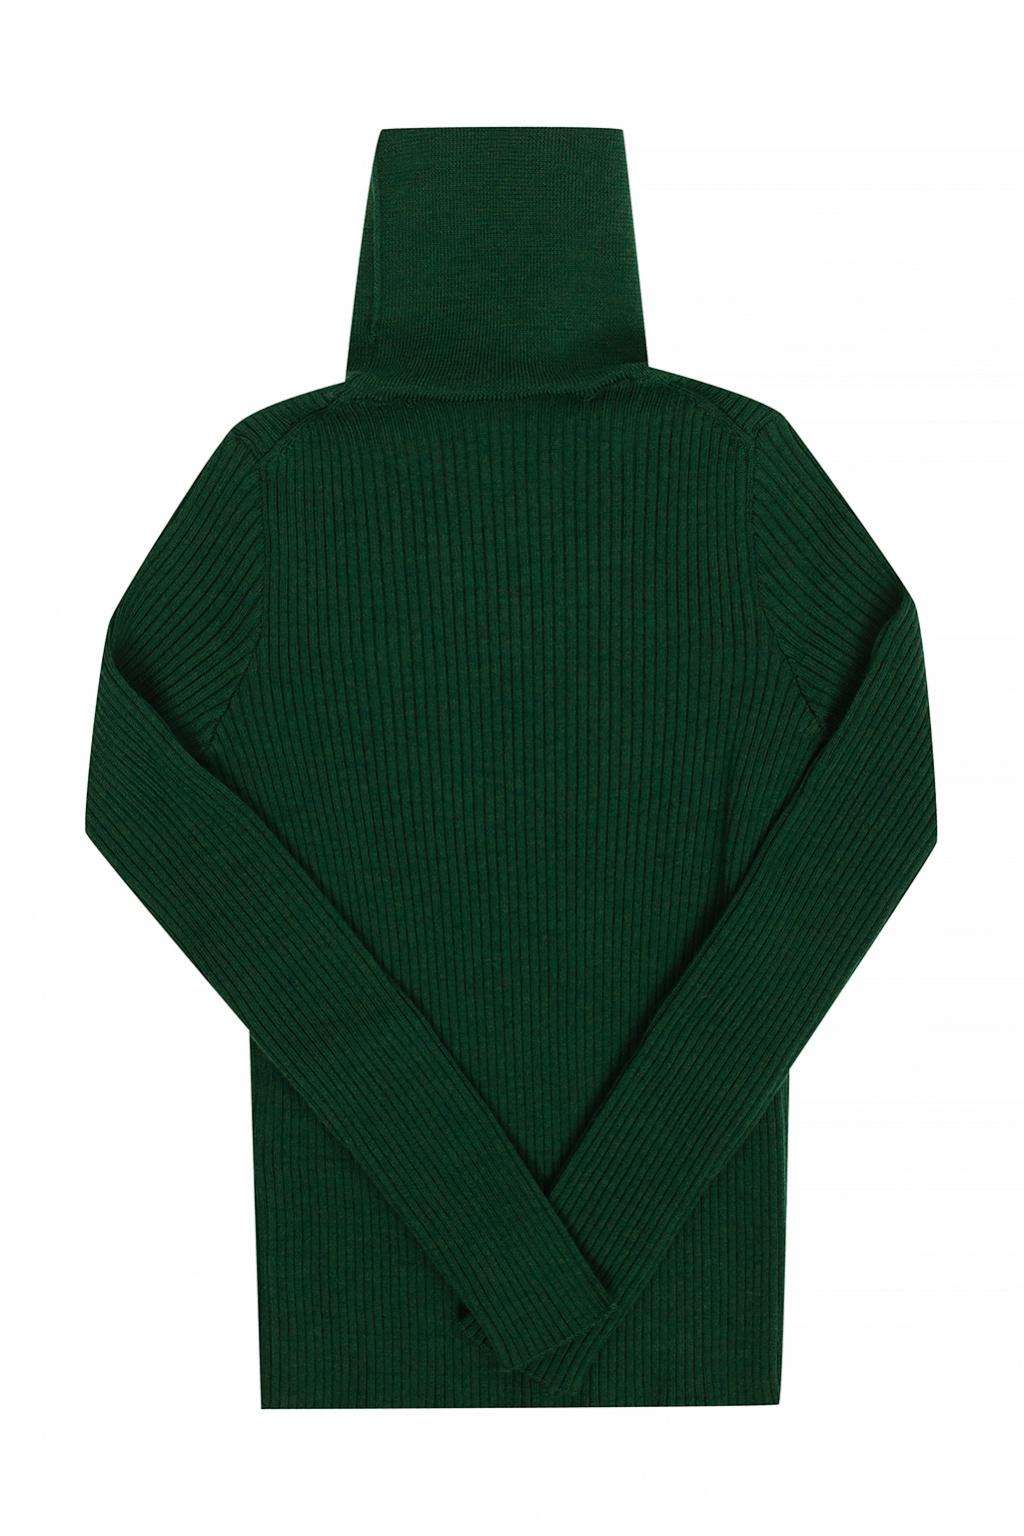 Gucci Kids Wool turtleneck sweater